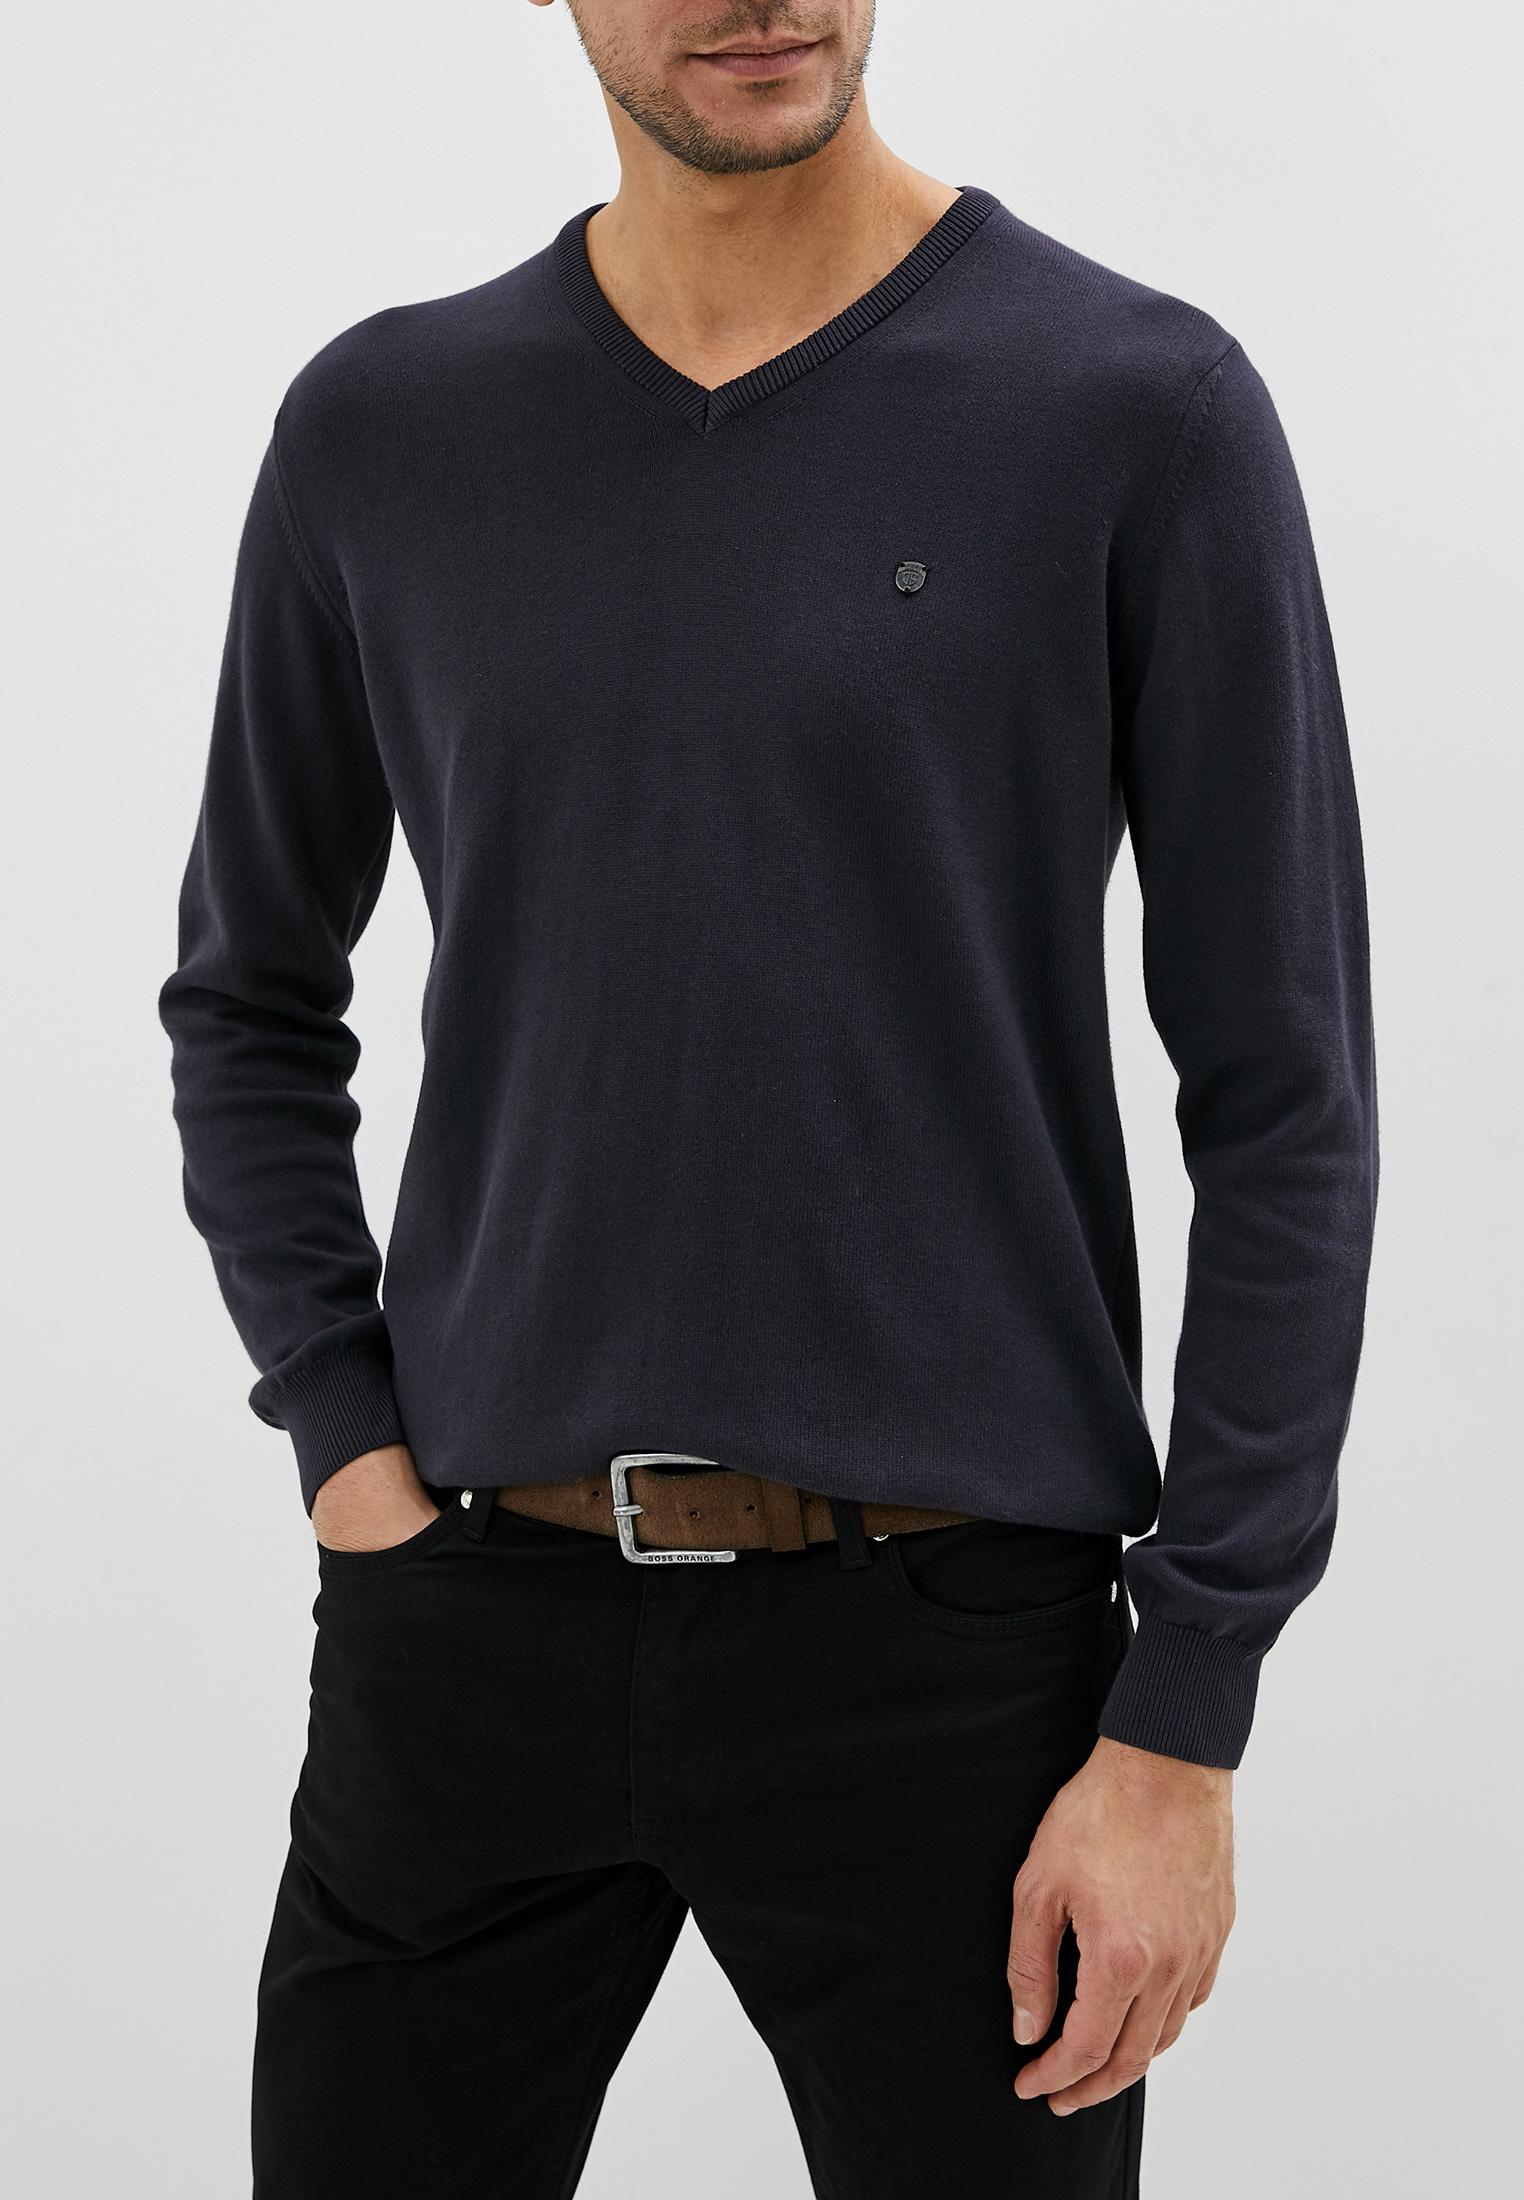 Пуловер JIMMY SANDERS (Джимми Сандерс) 19W KM5061